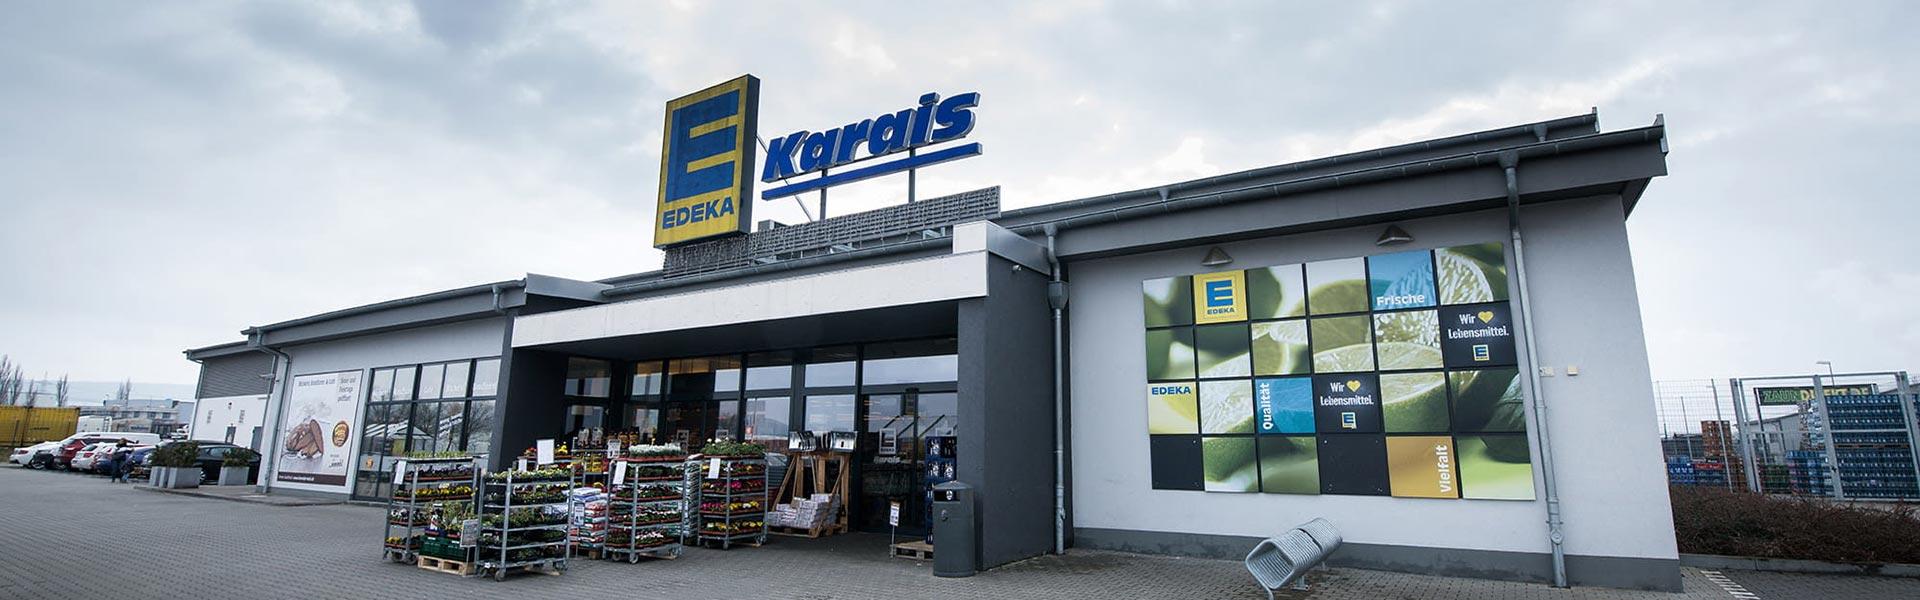 EDEKA Karais in Knetzgau